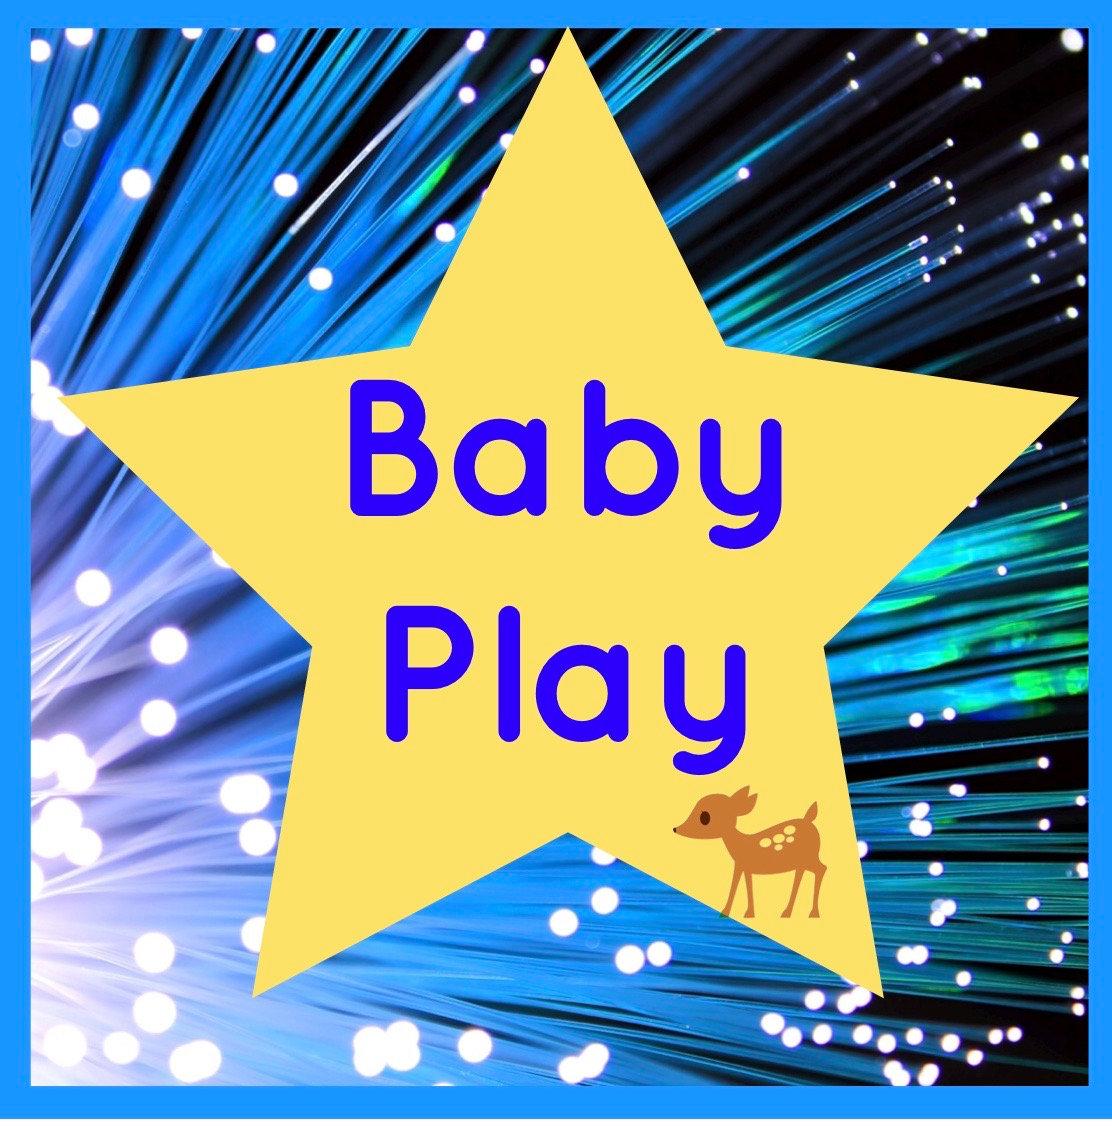 Baby Play Wednesdays 9:30 - 10:15 am